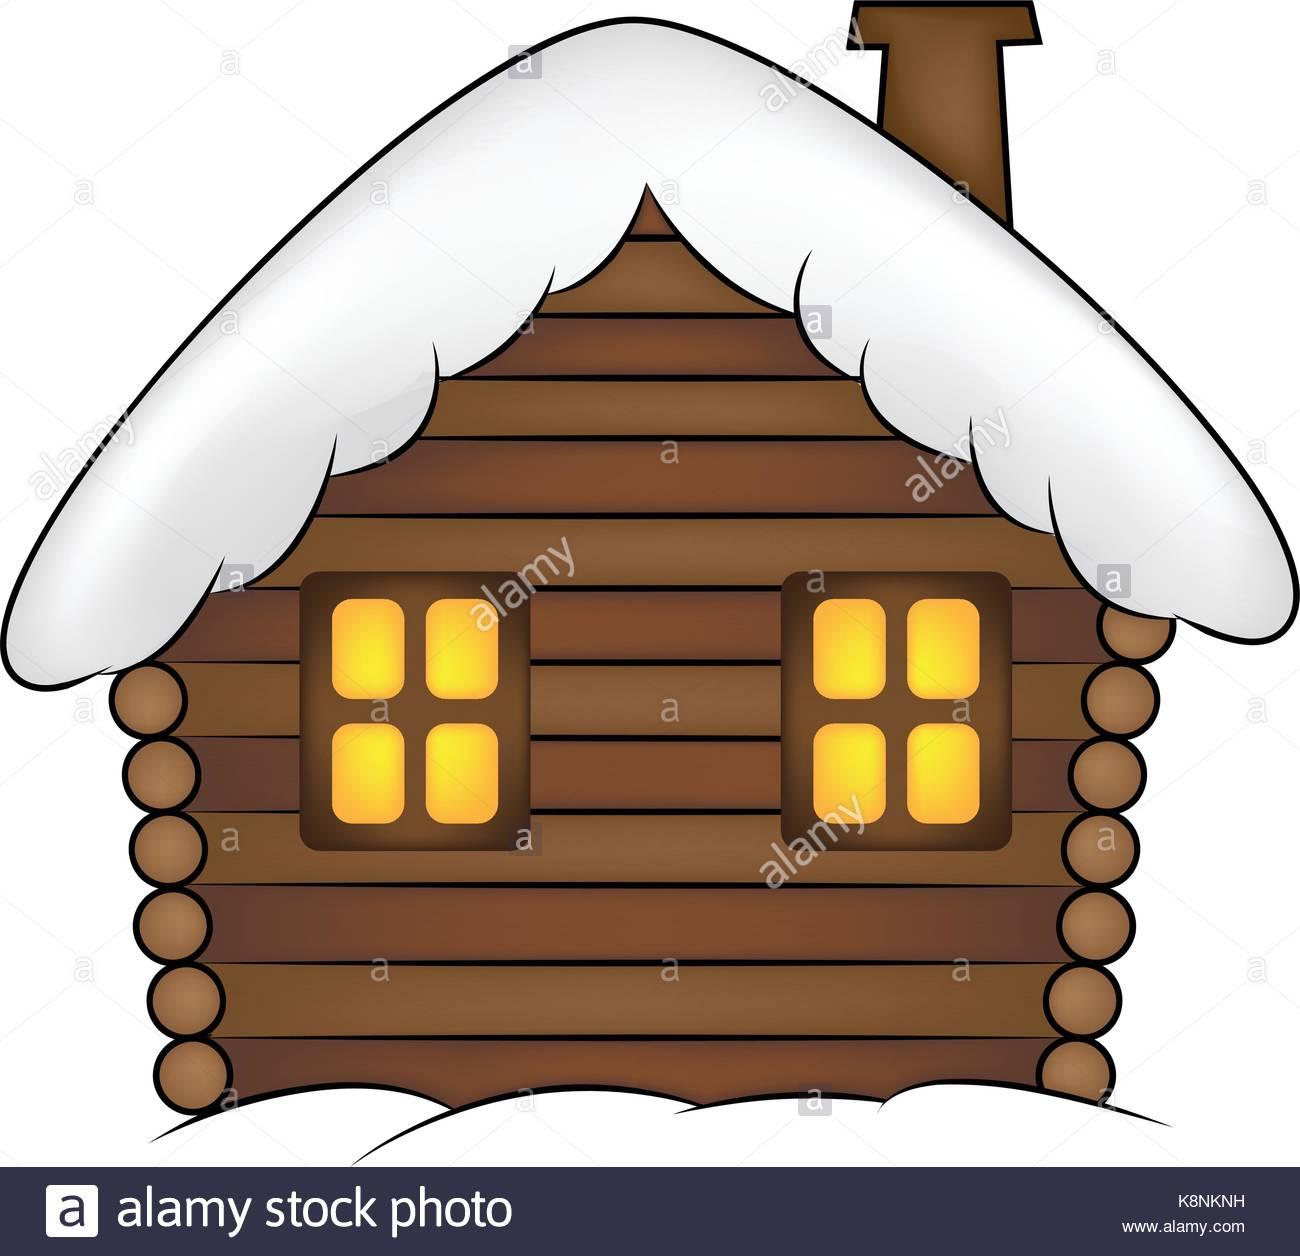 1300x1256 House With Snow Cartoon Illustration. Winter Snowy Christmas Home